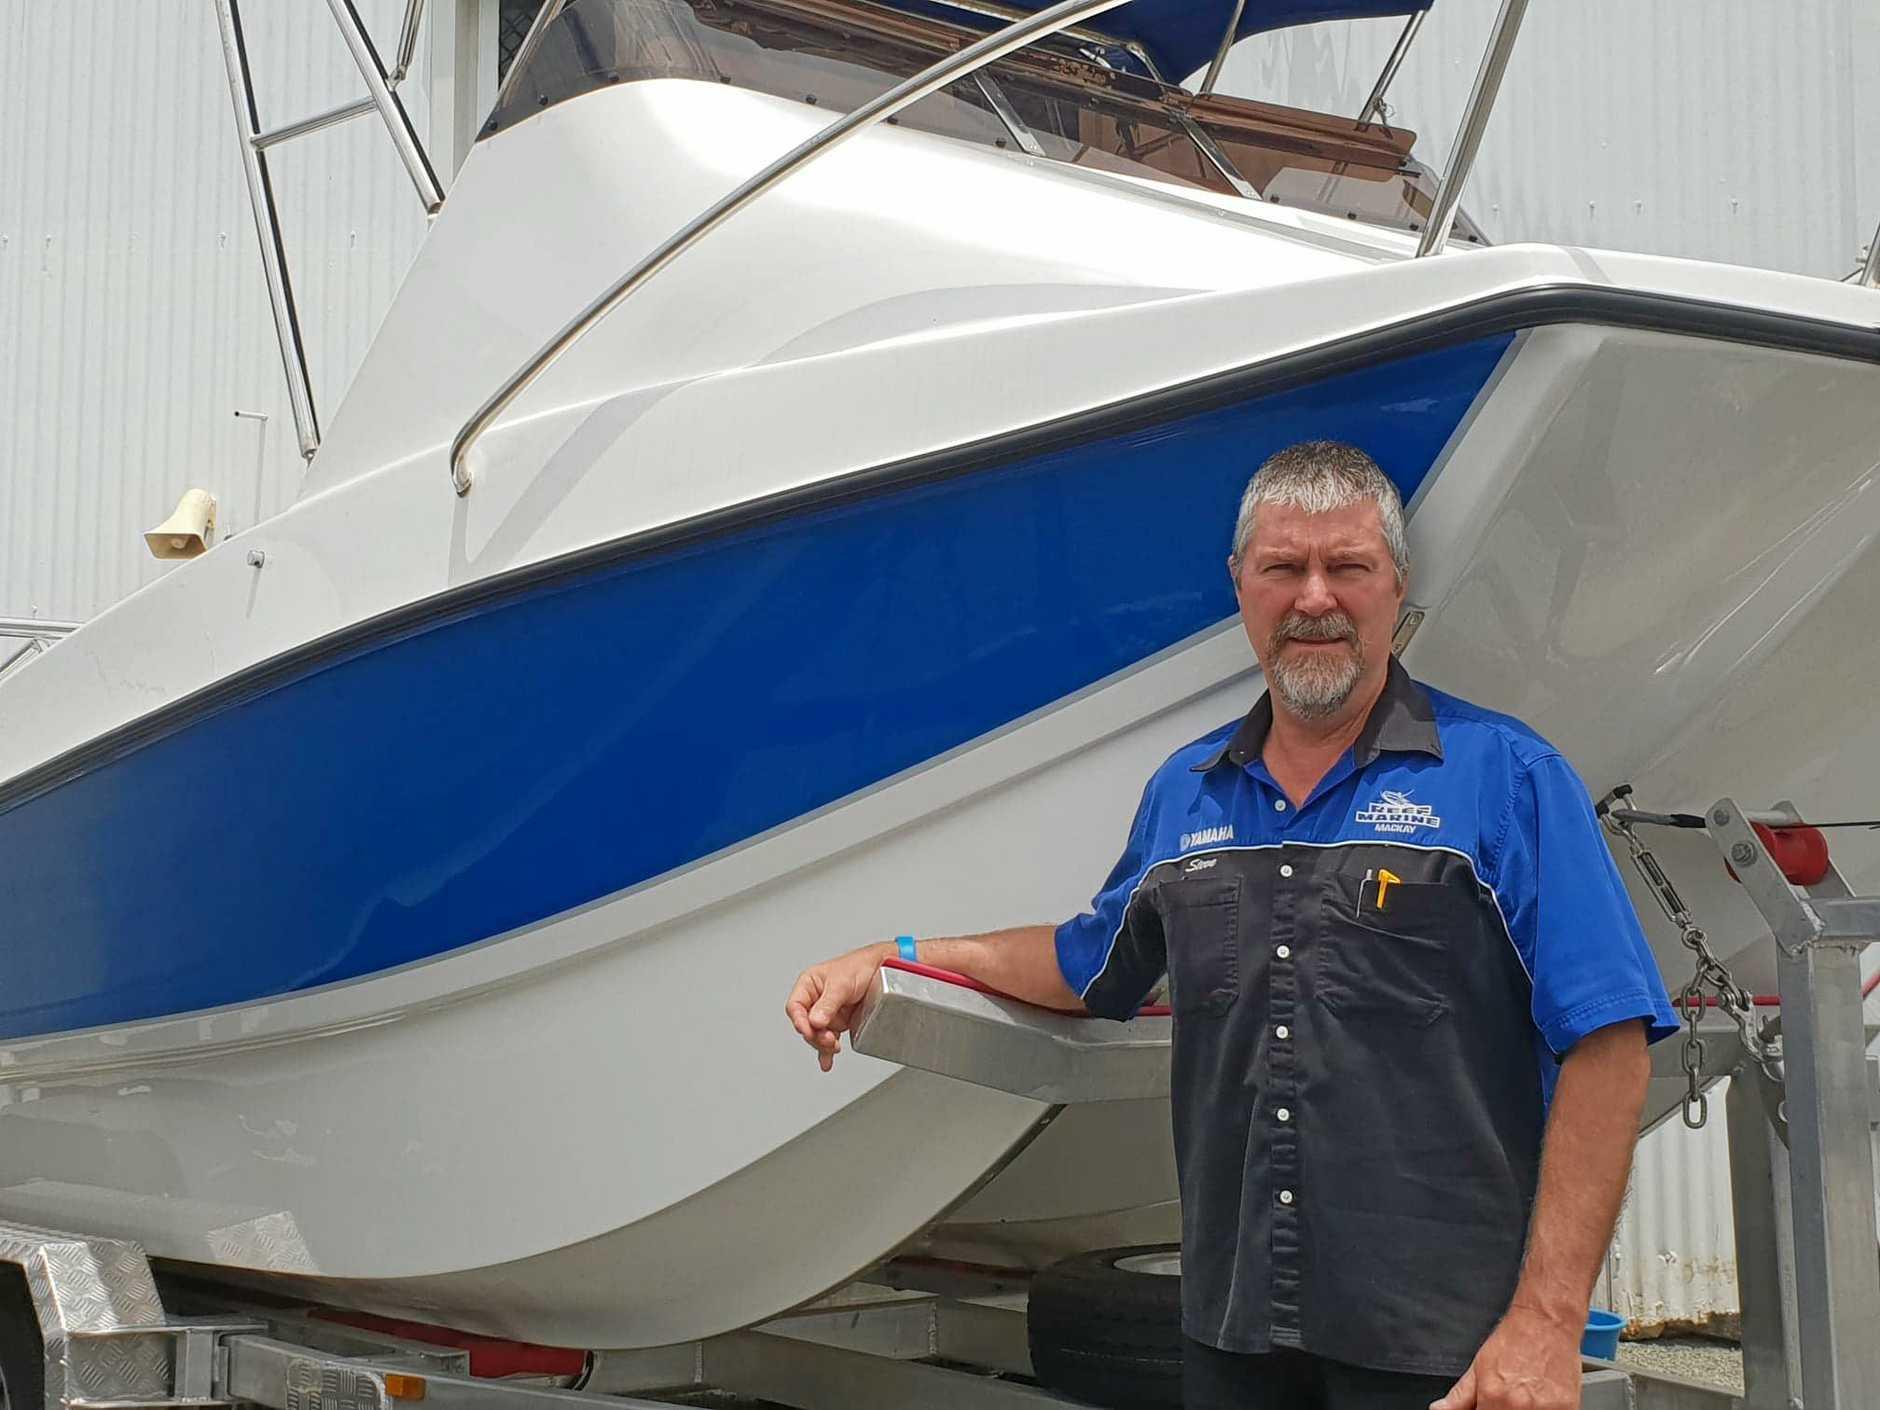 MILESTONE YEAR: Steve Wicks, of Reef Marine, celebrated 40 years in the industry this year.